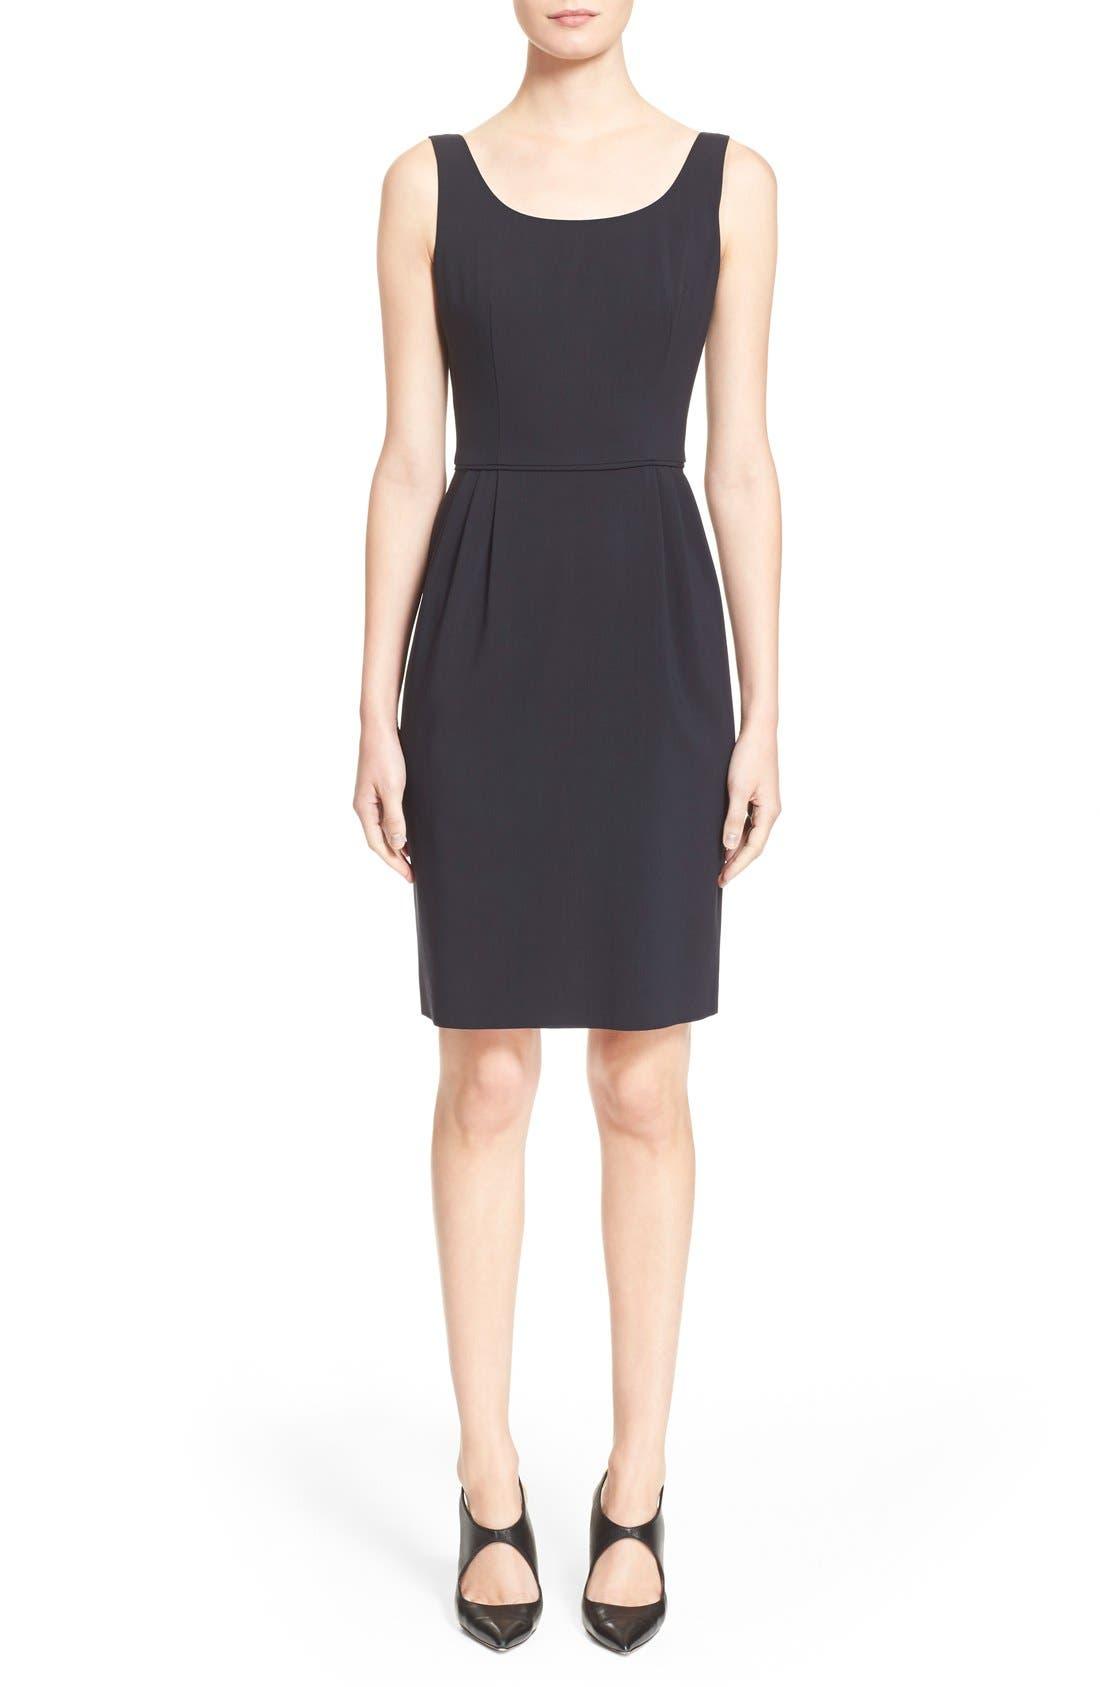 Alternate Image 1 Selected - Armani Collezioni Featherweight Wool Dress